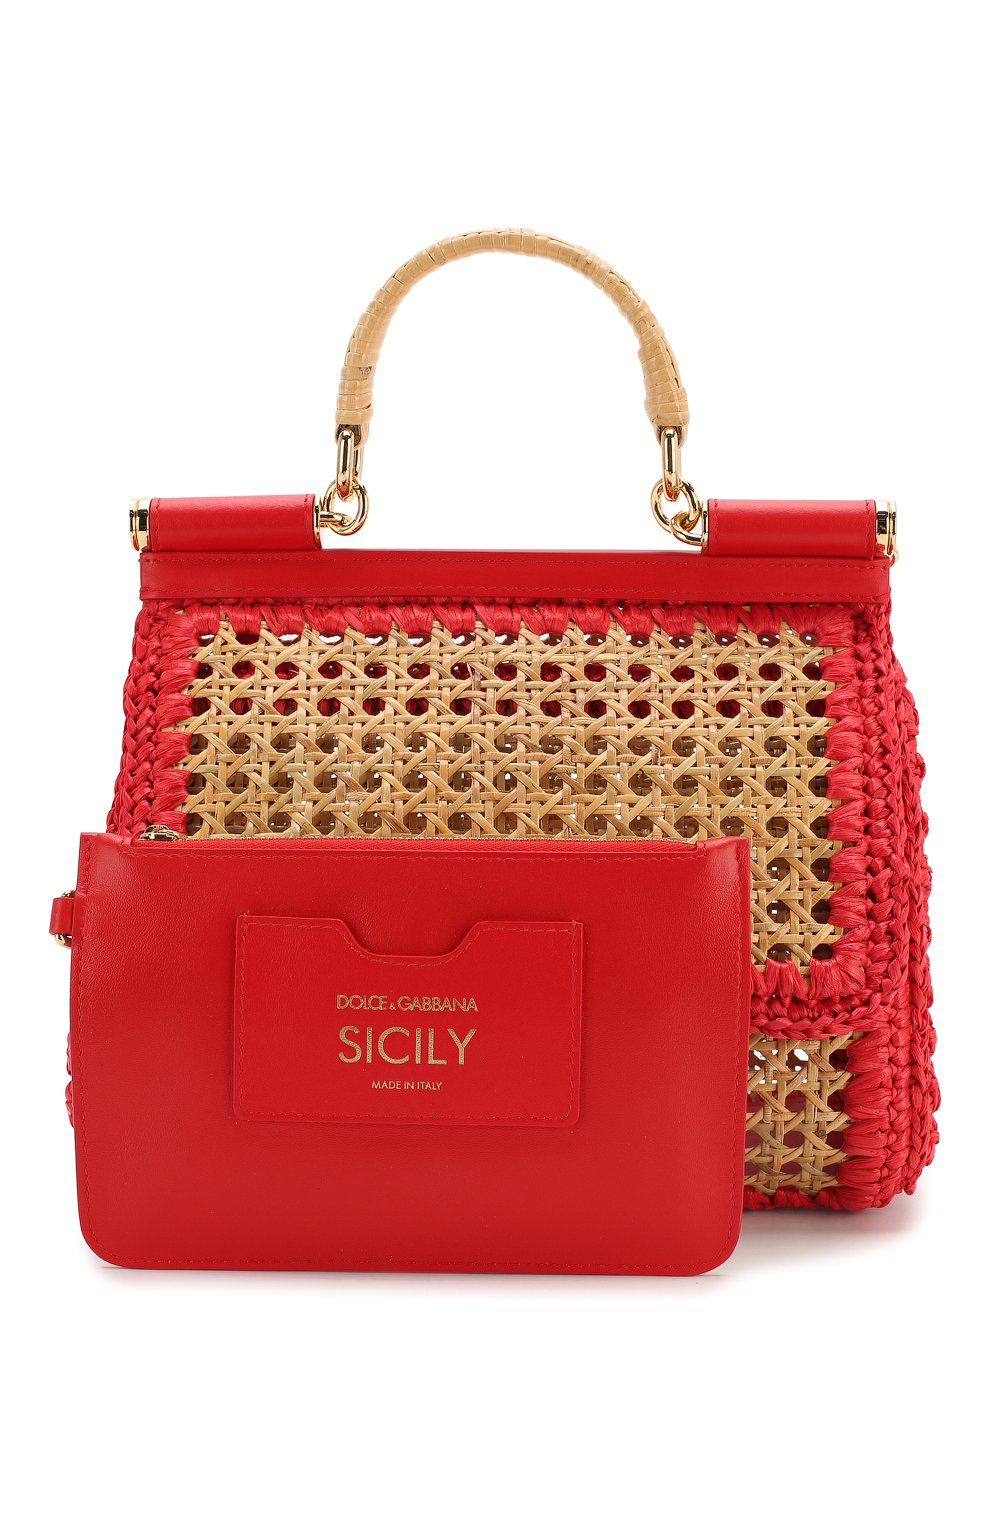 Сумка Sicily medium Dolce & Gabbana бежевая цвета   Фото №7